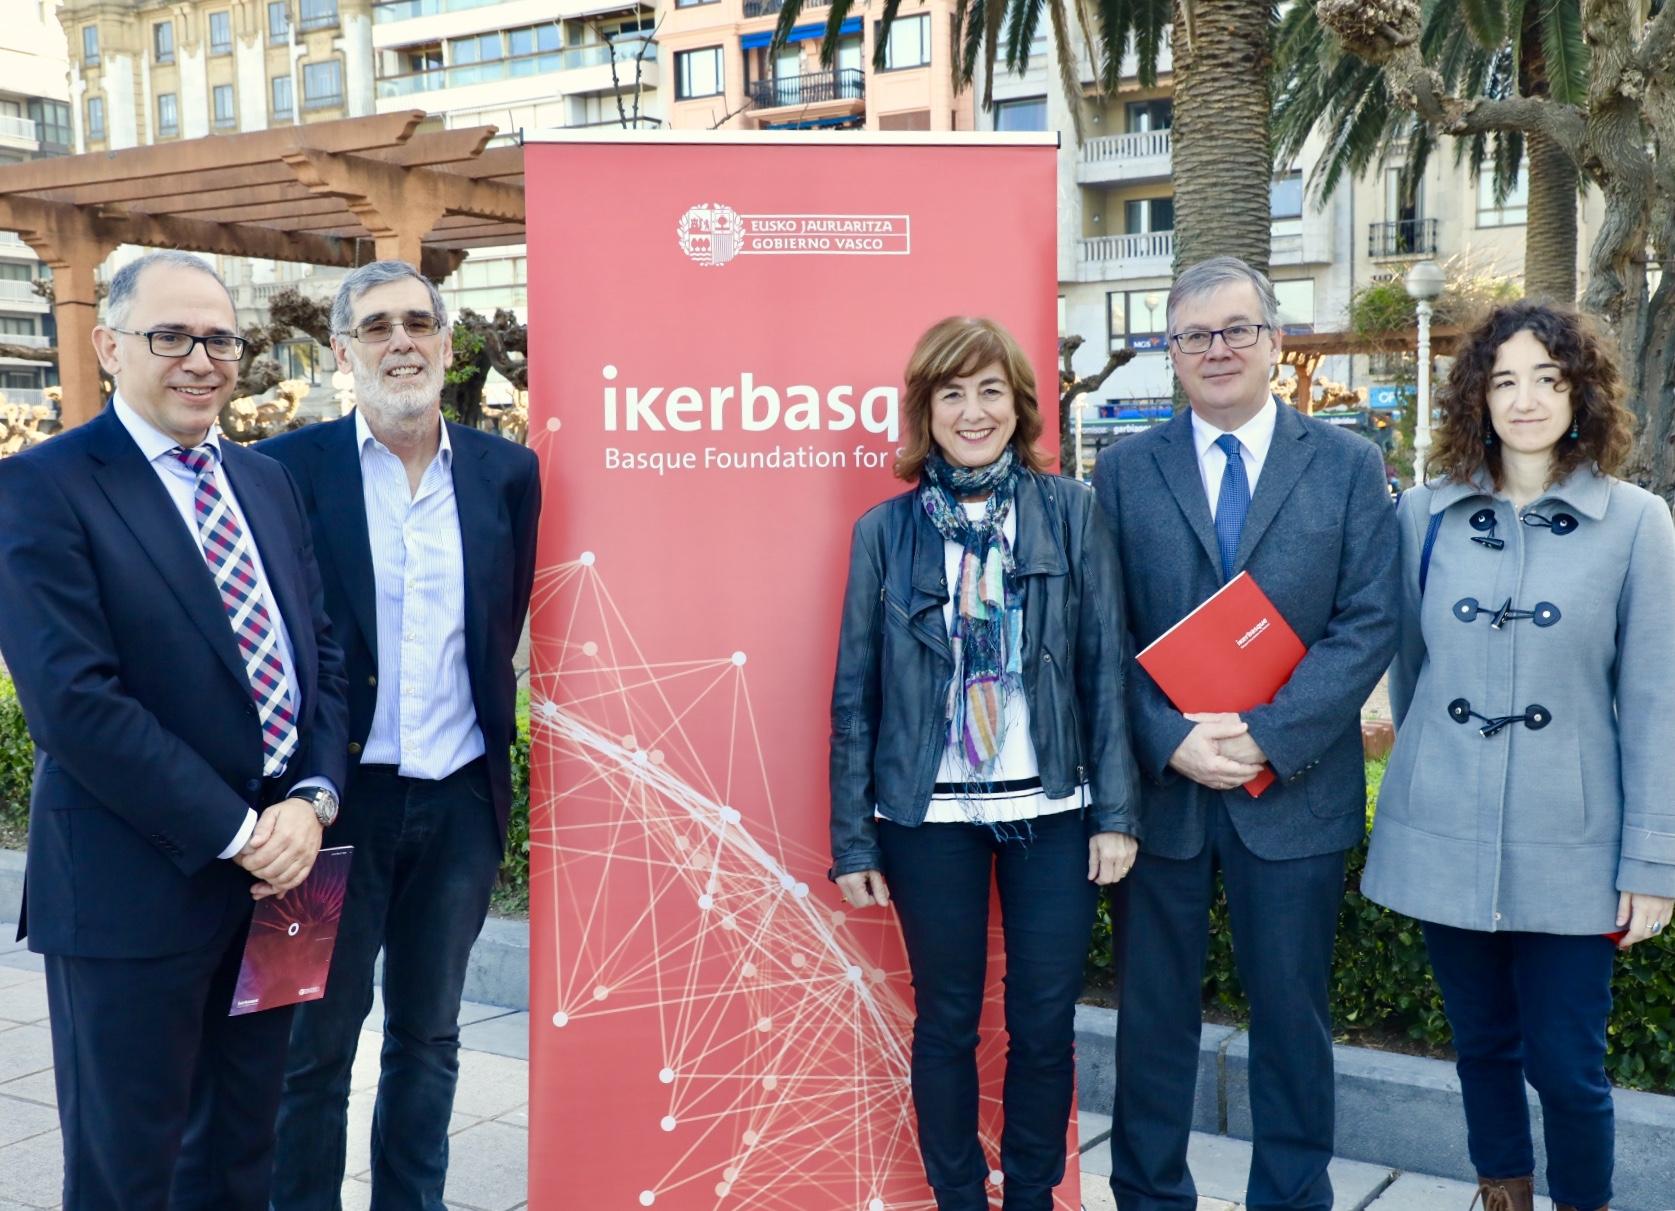 Los investigadores e investigadoras Ikerbasque lograron en 2018 atraer a Euskadi fondos por valor de más de 28 millones de euros